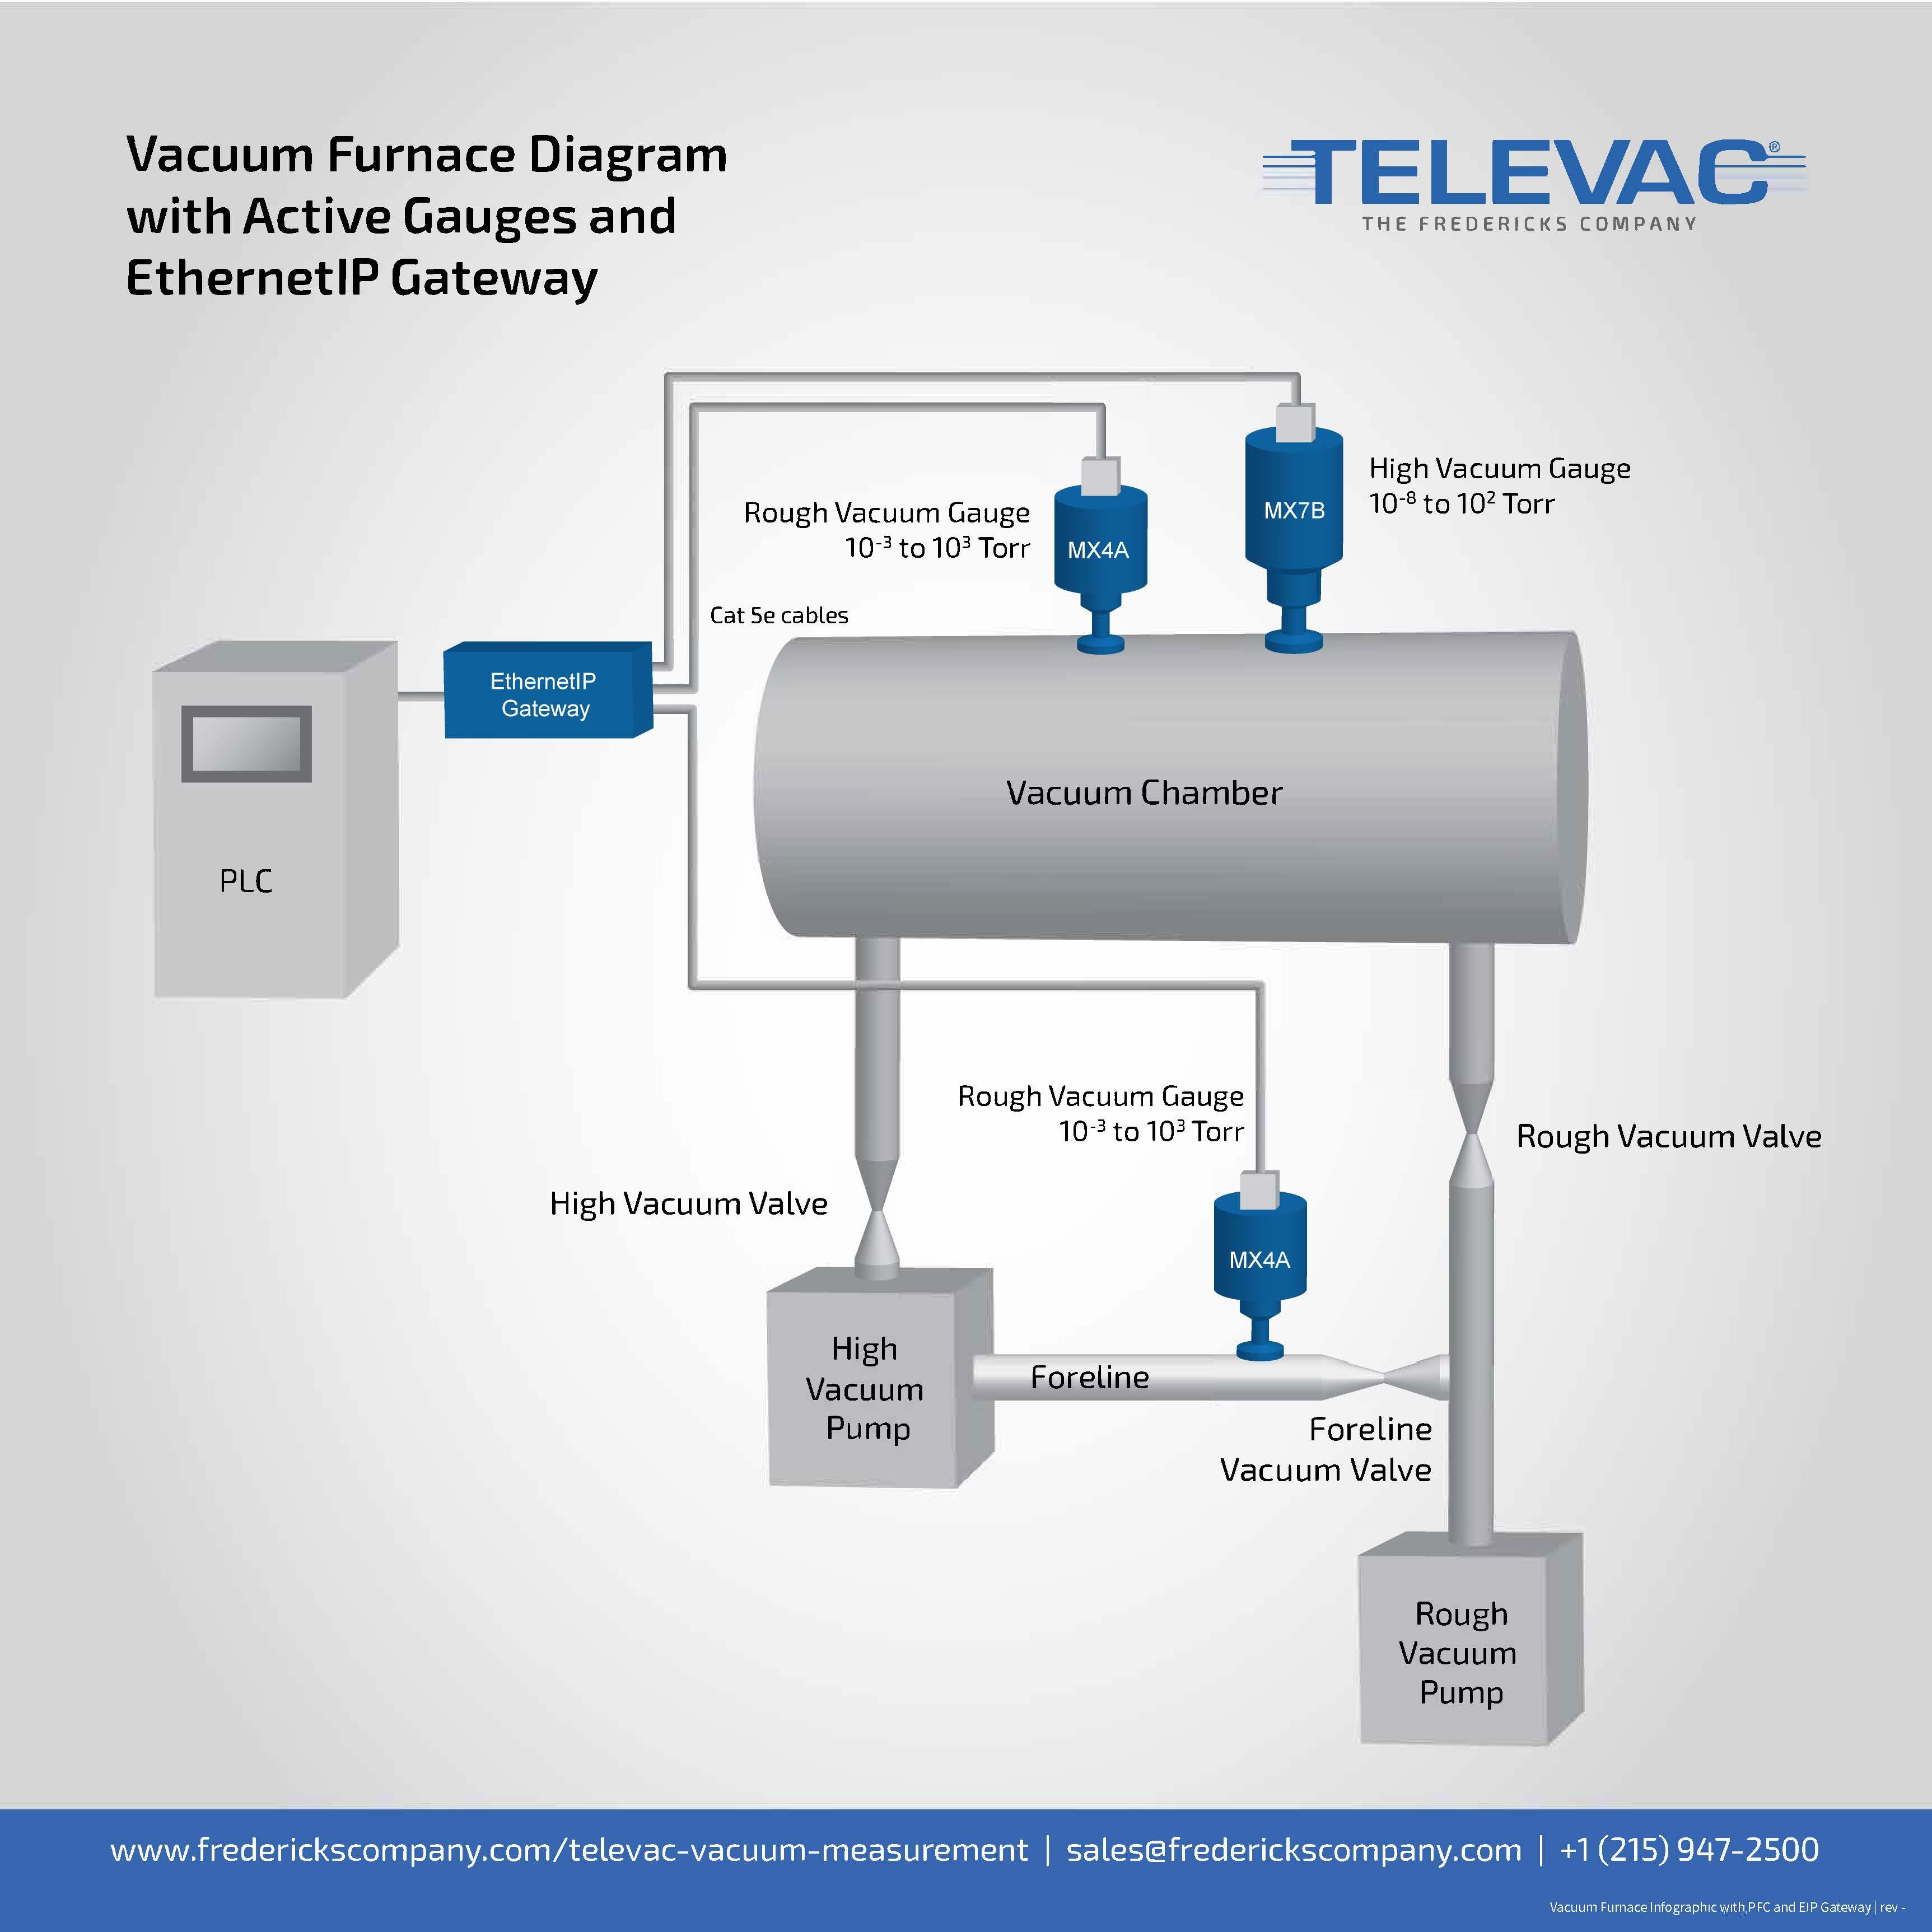 Vacuum Furnace Diagram Typical Active Gauge Configuration The Pump